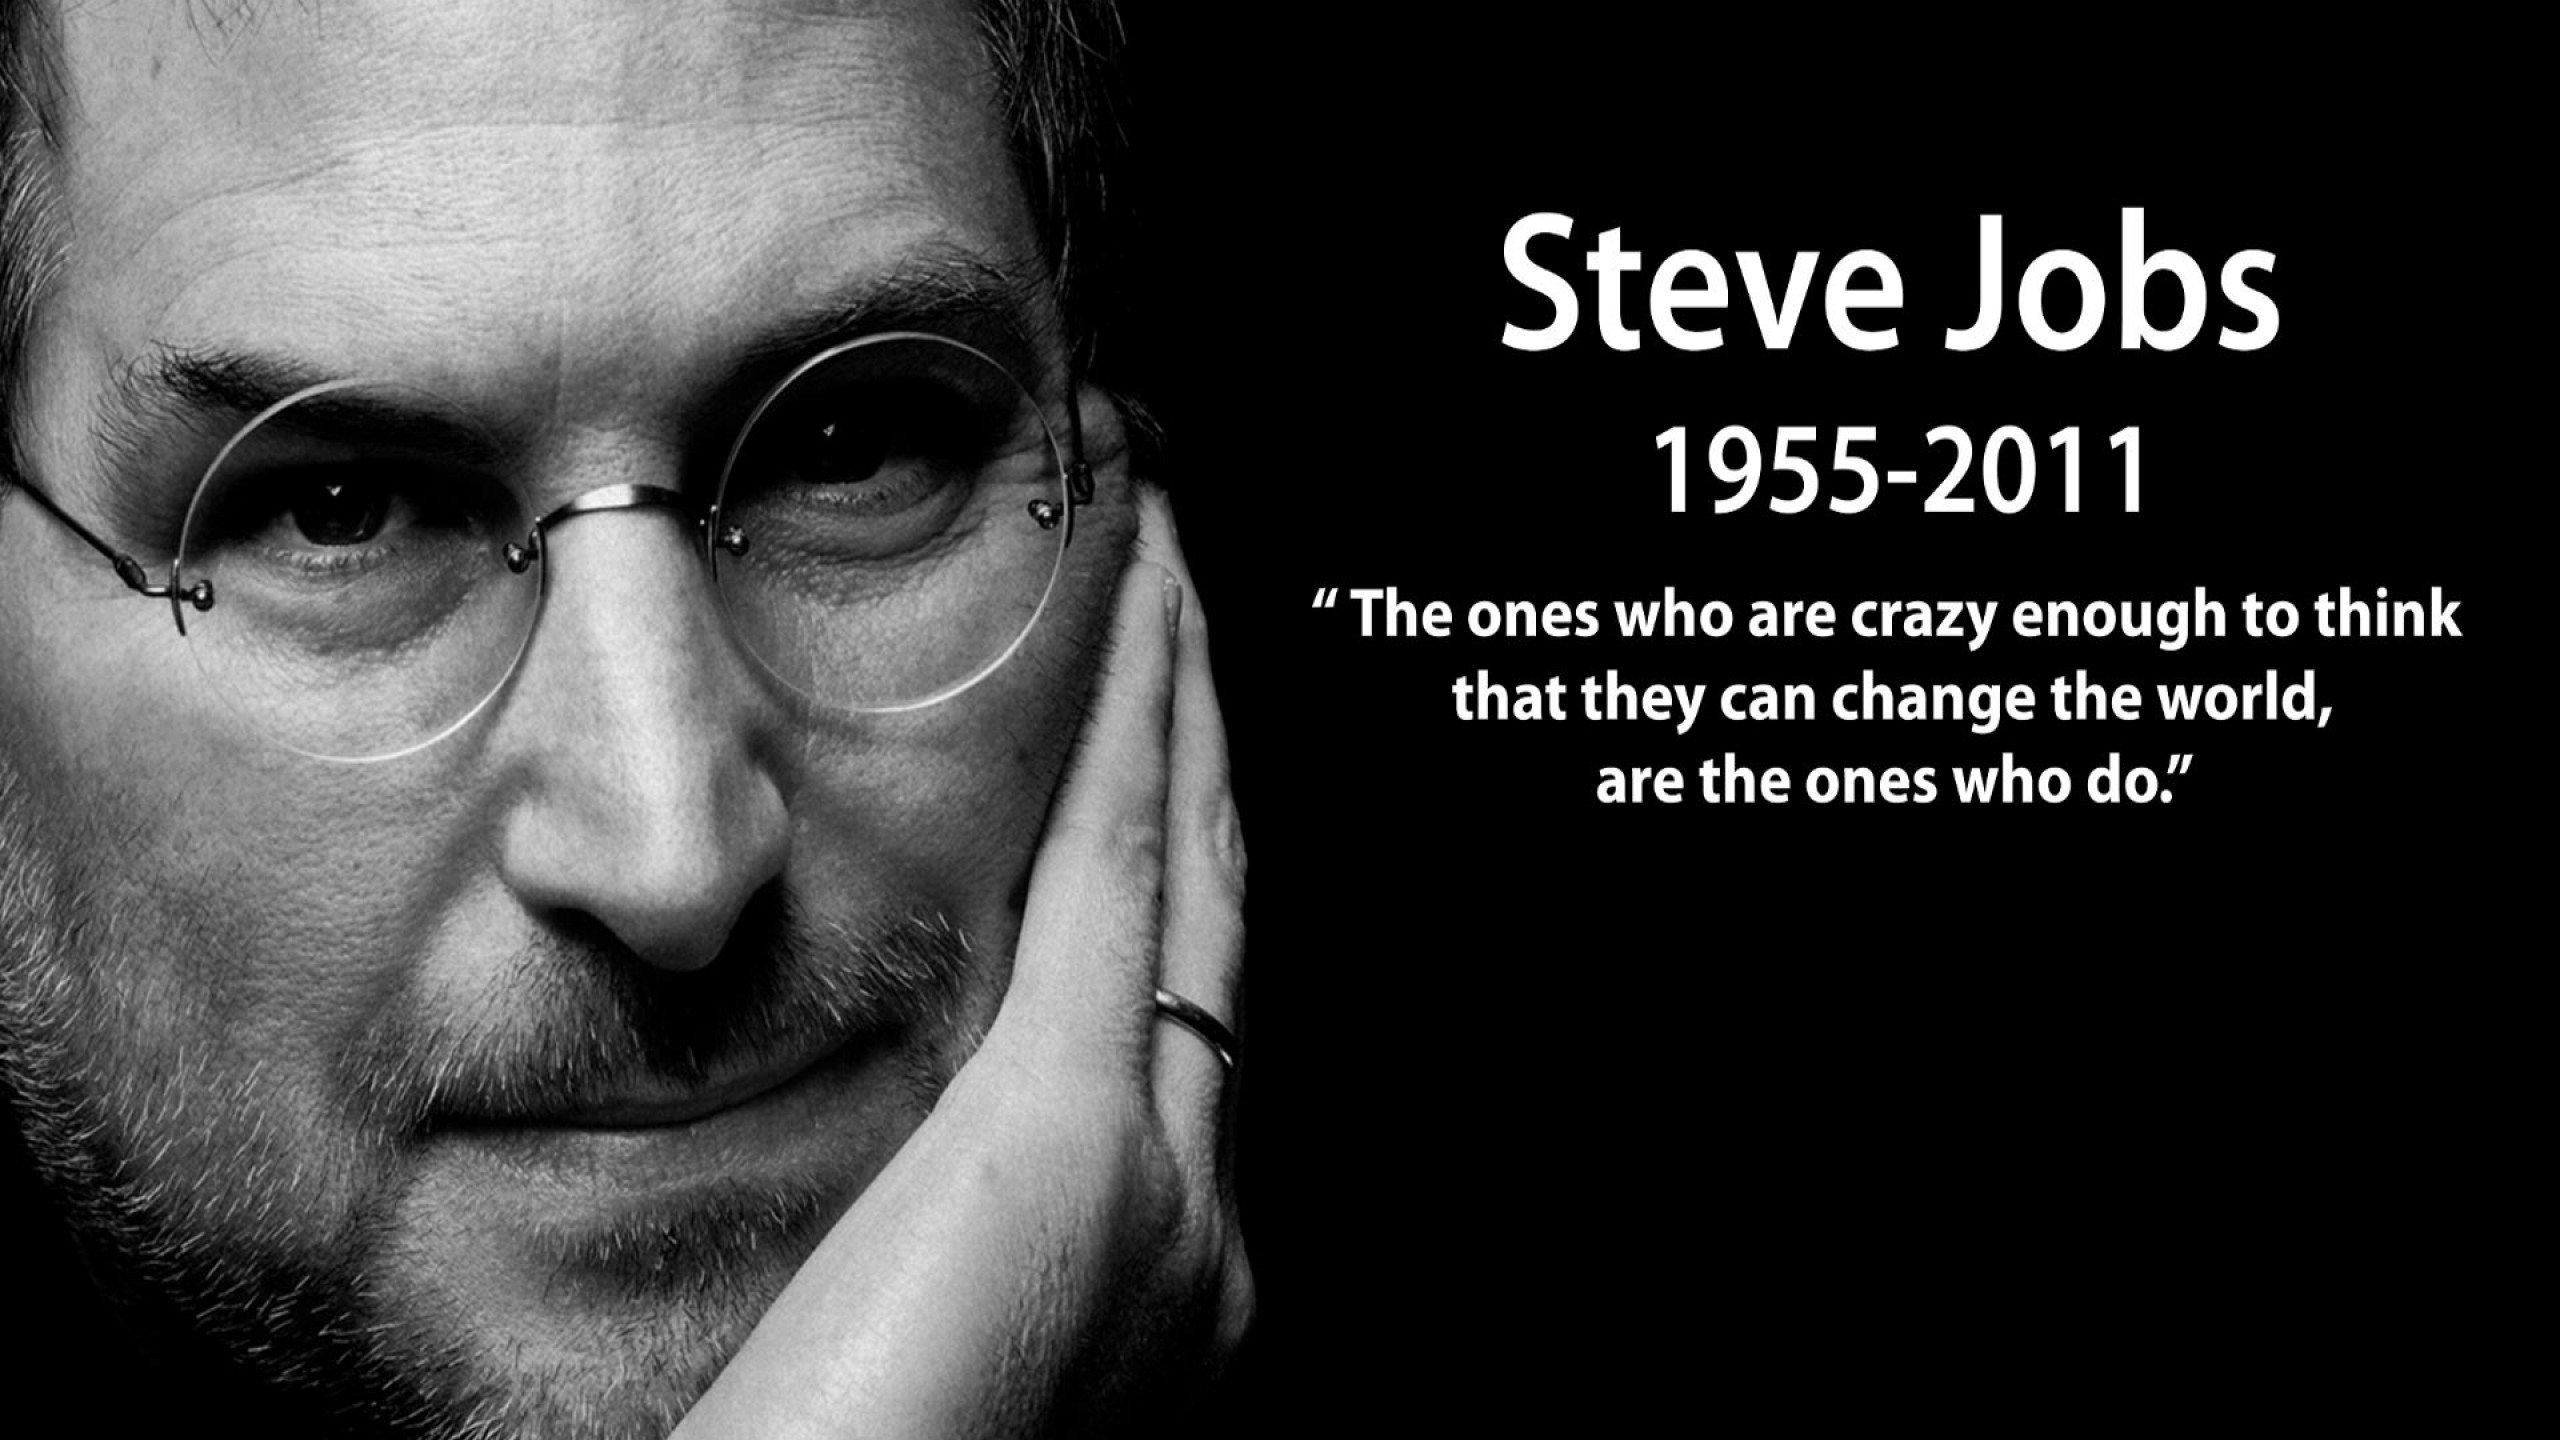 Steve Jobs Introducing iPhone 4